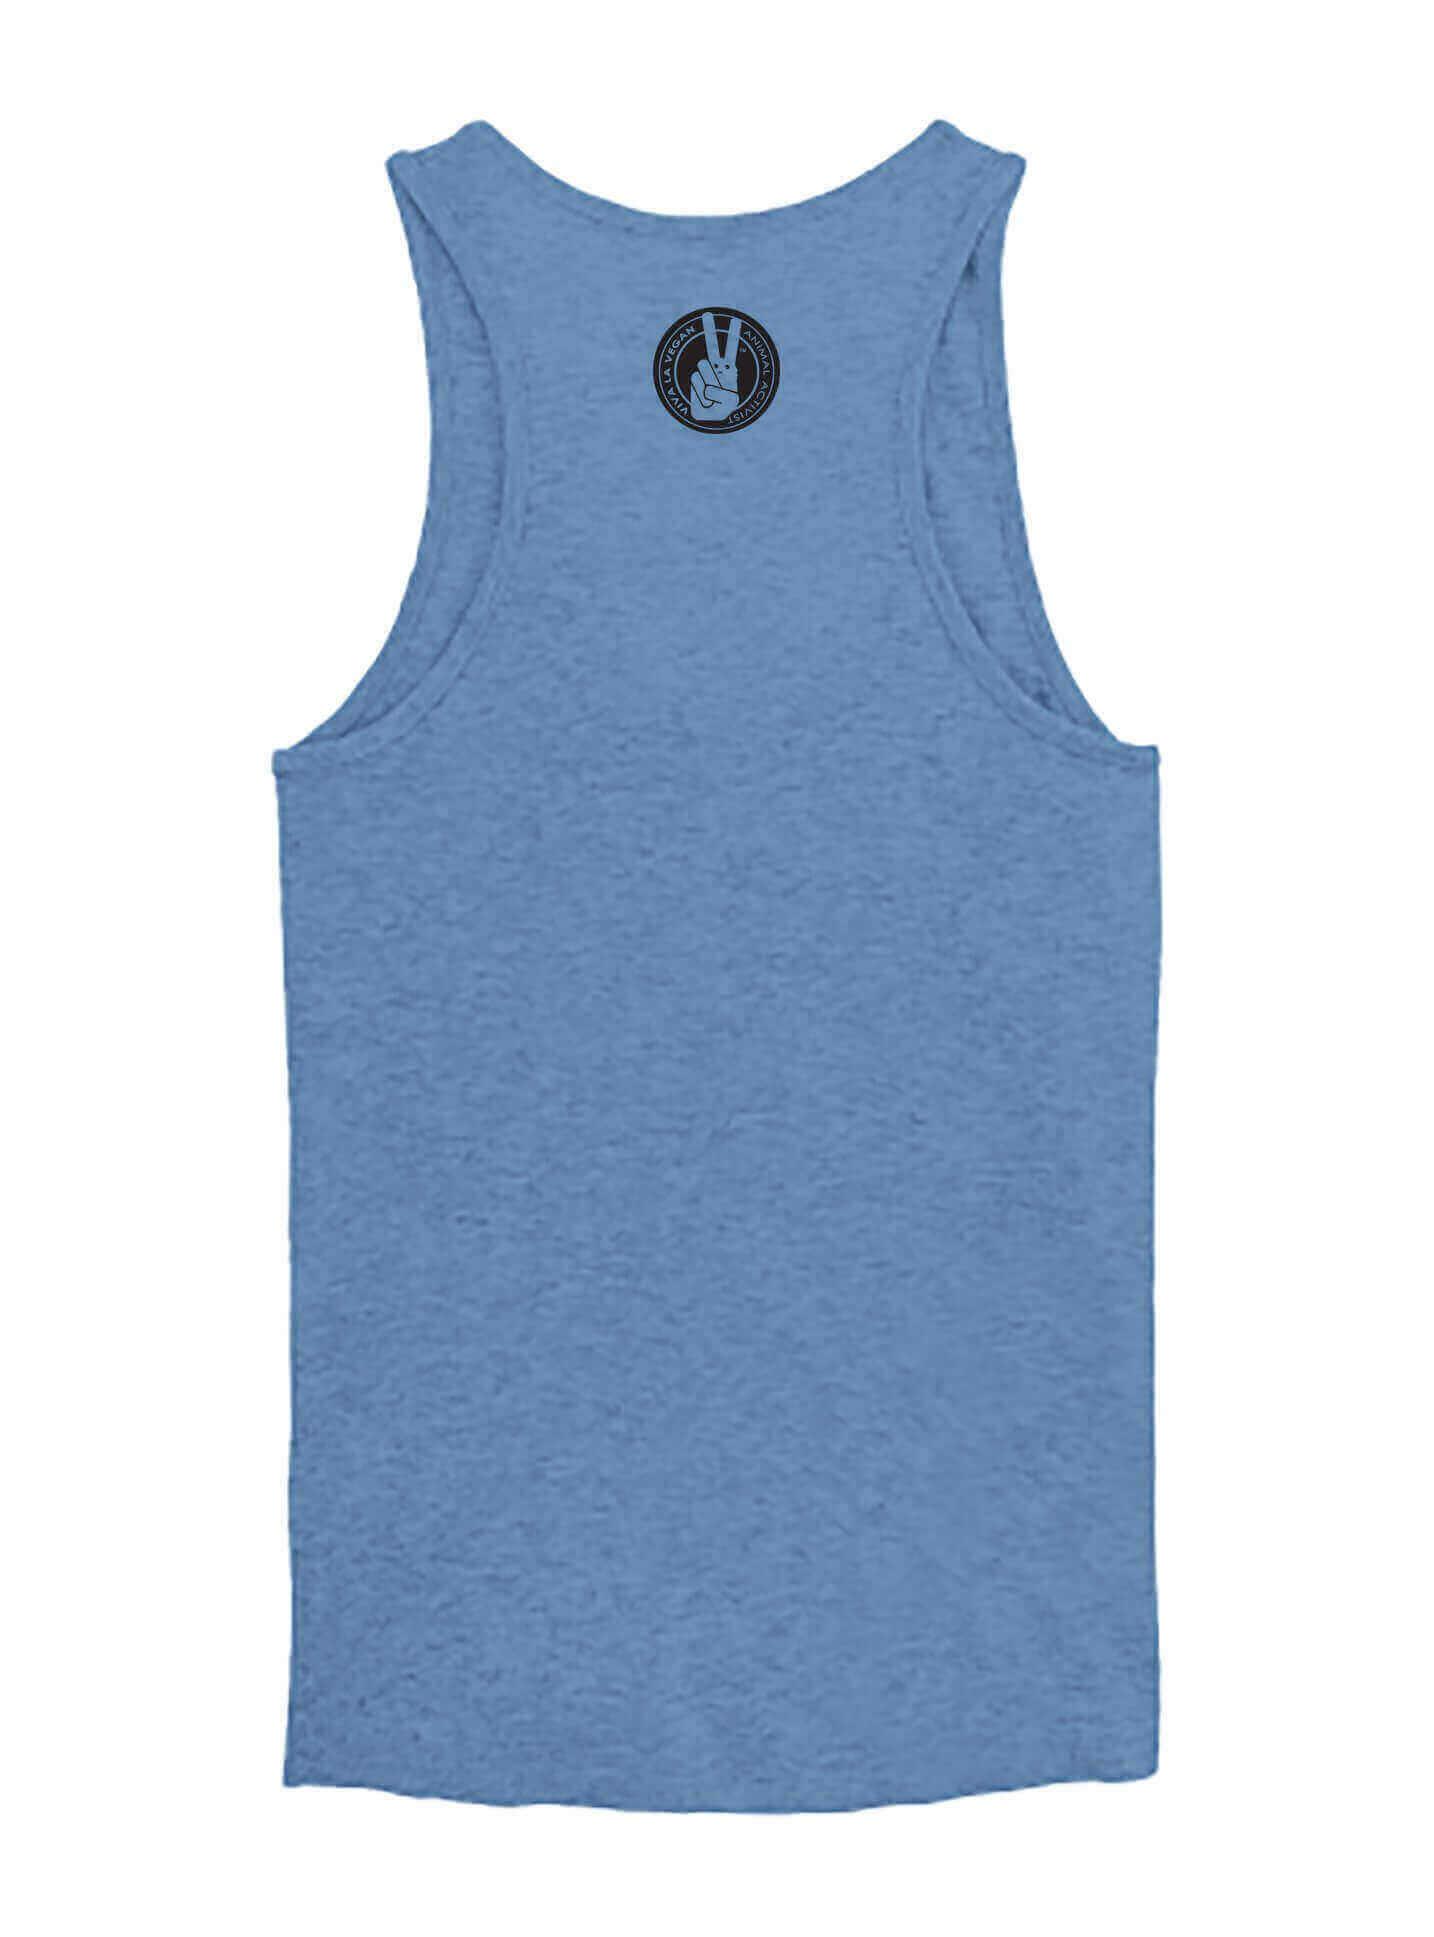 Women's Vest: Vegan Tribe: BLUE HEATHER